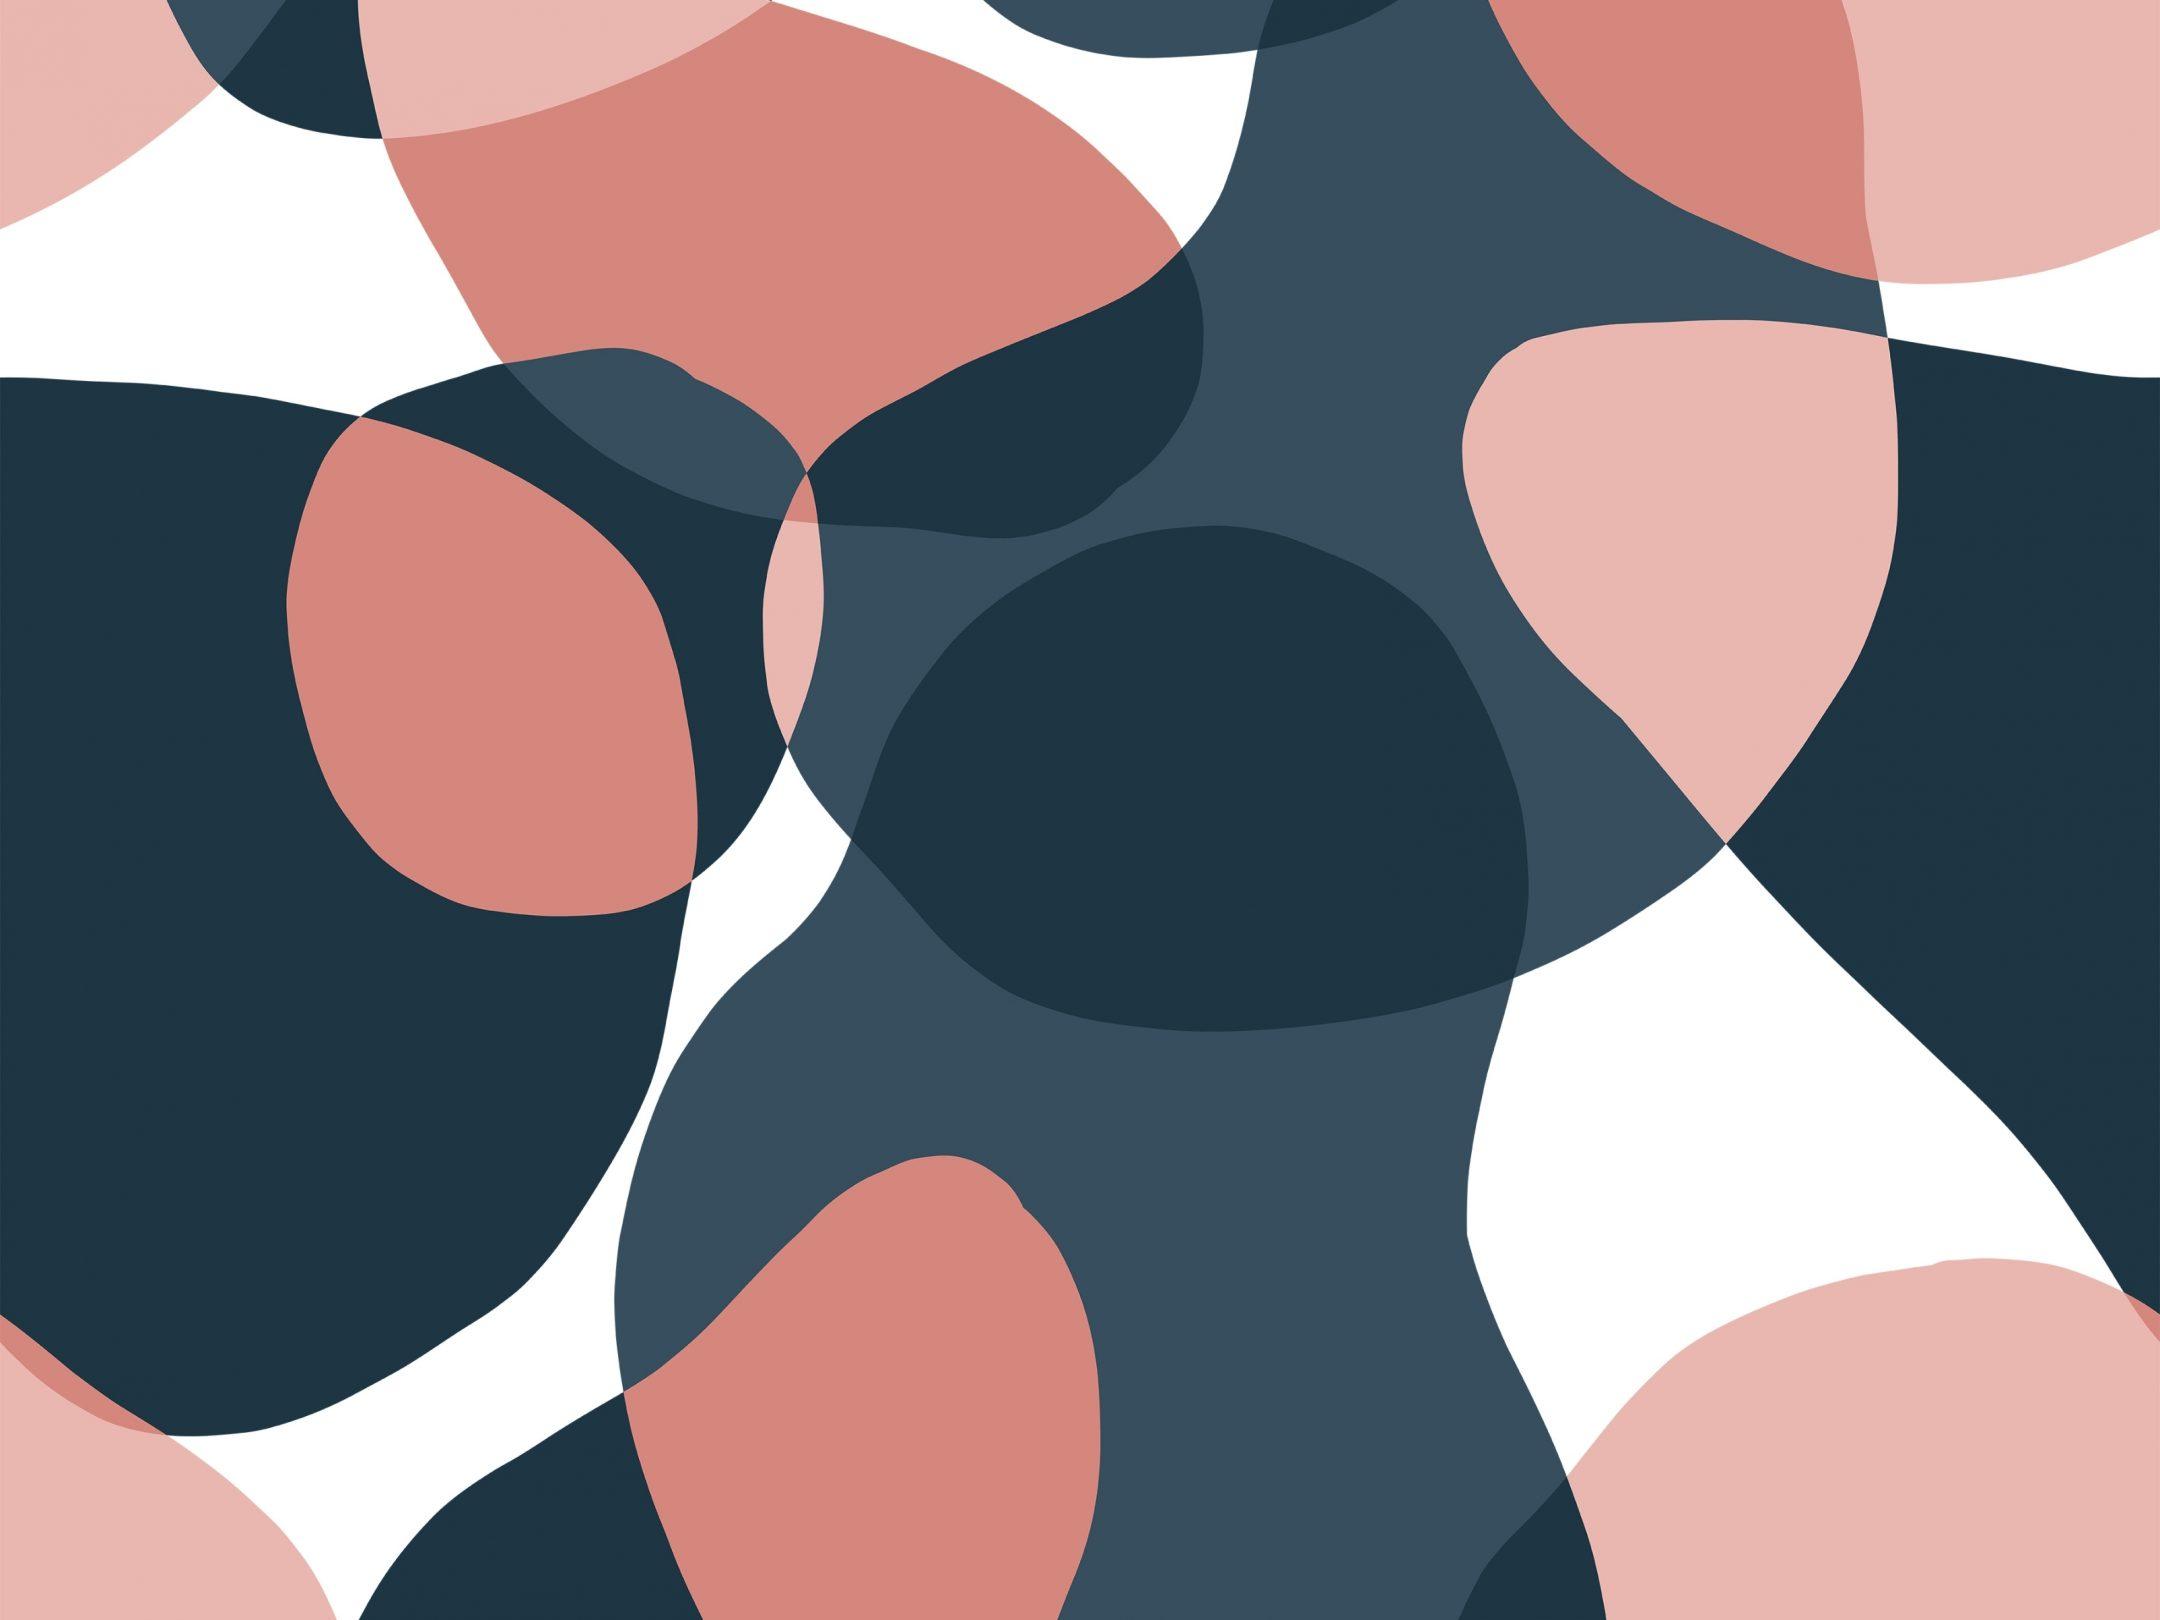 2160x1620 iPad wallpaper 4k Garden Pattern Abstract Colorful iPad Wallpaper 2160x1620 pixels resolution